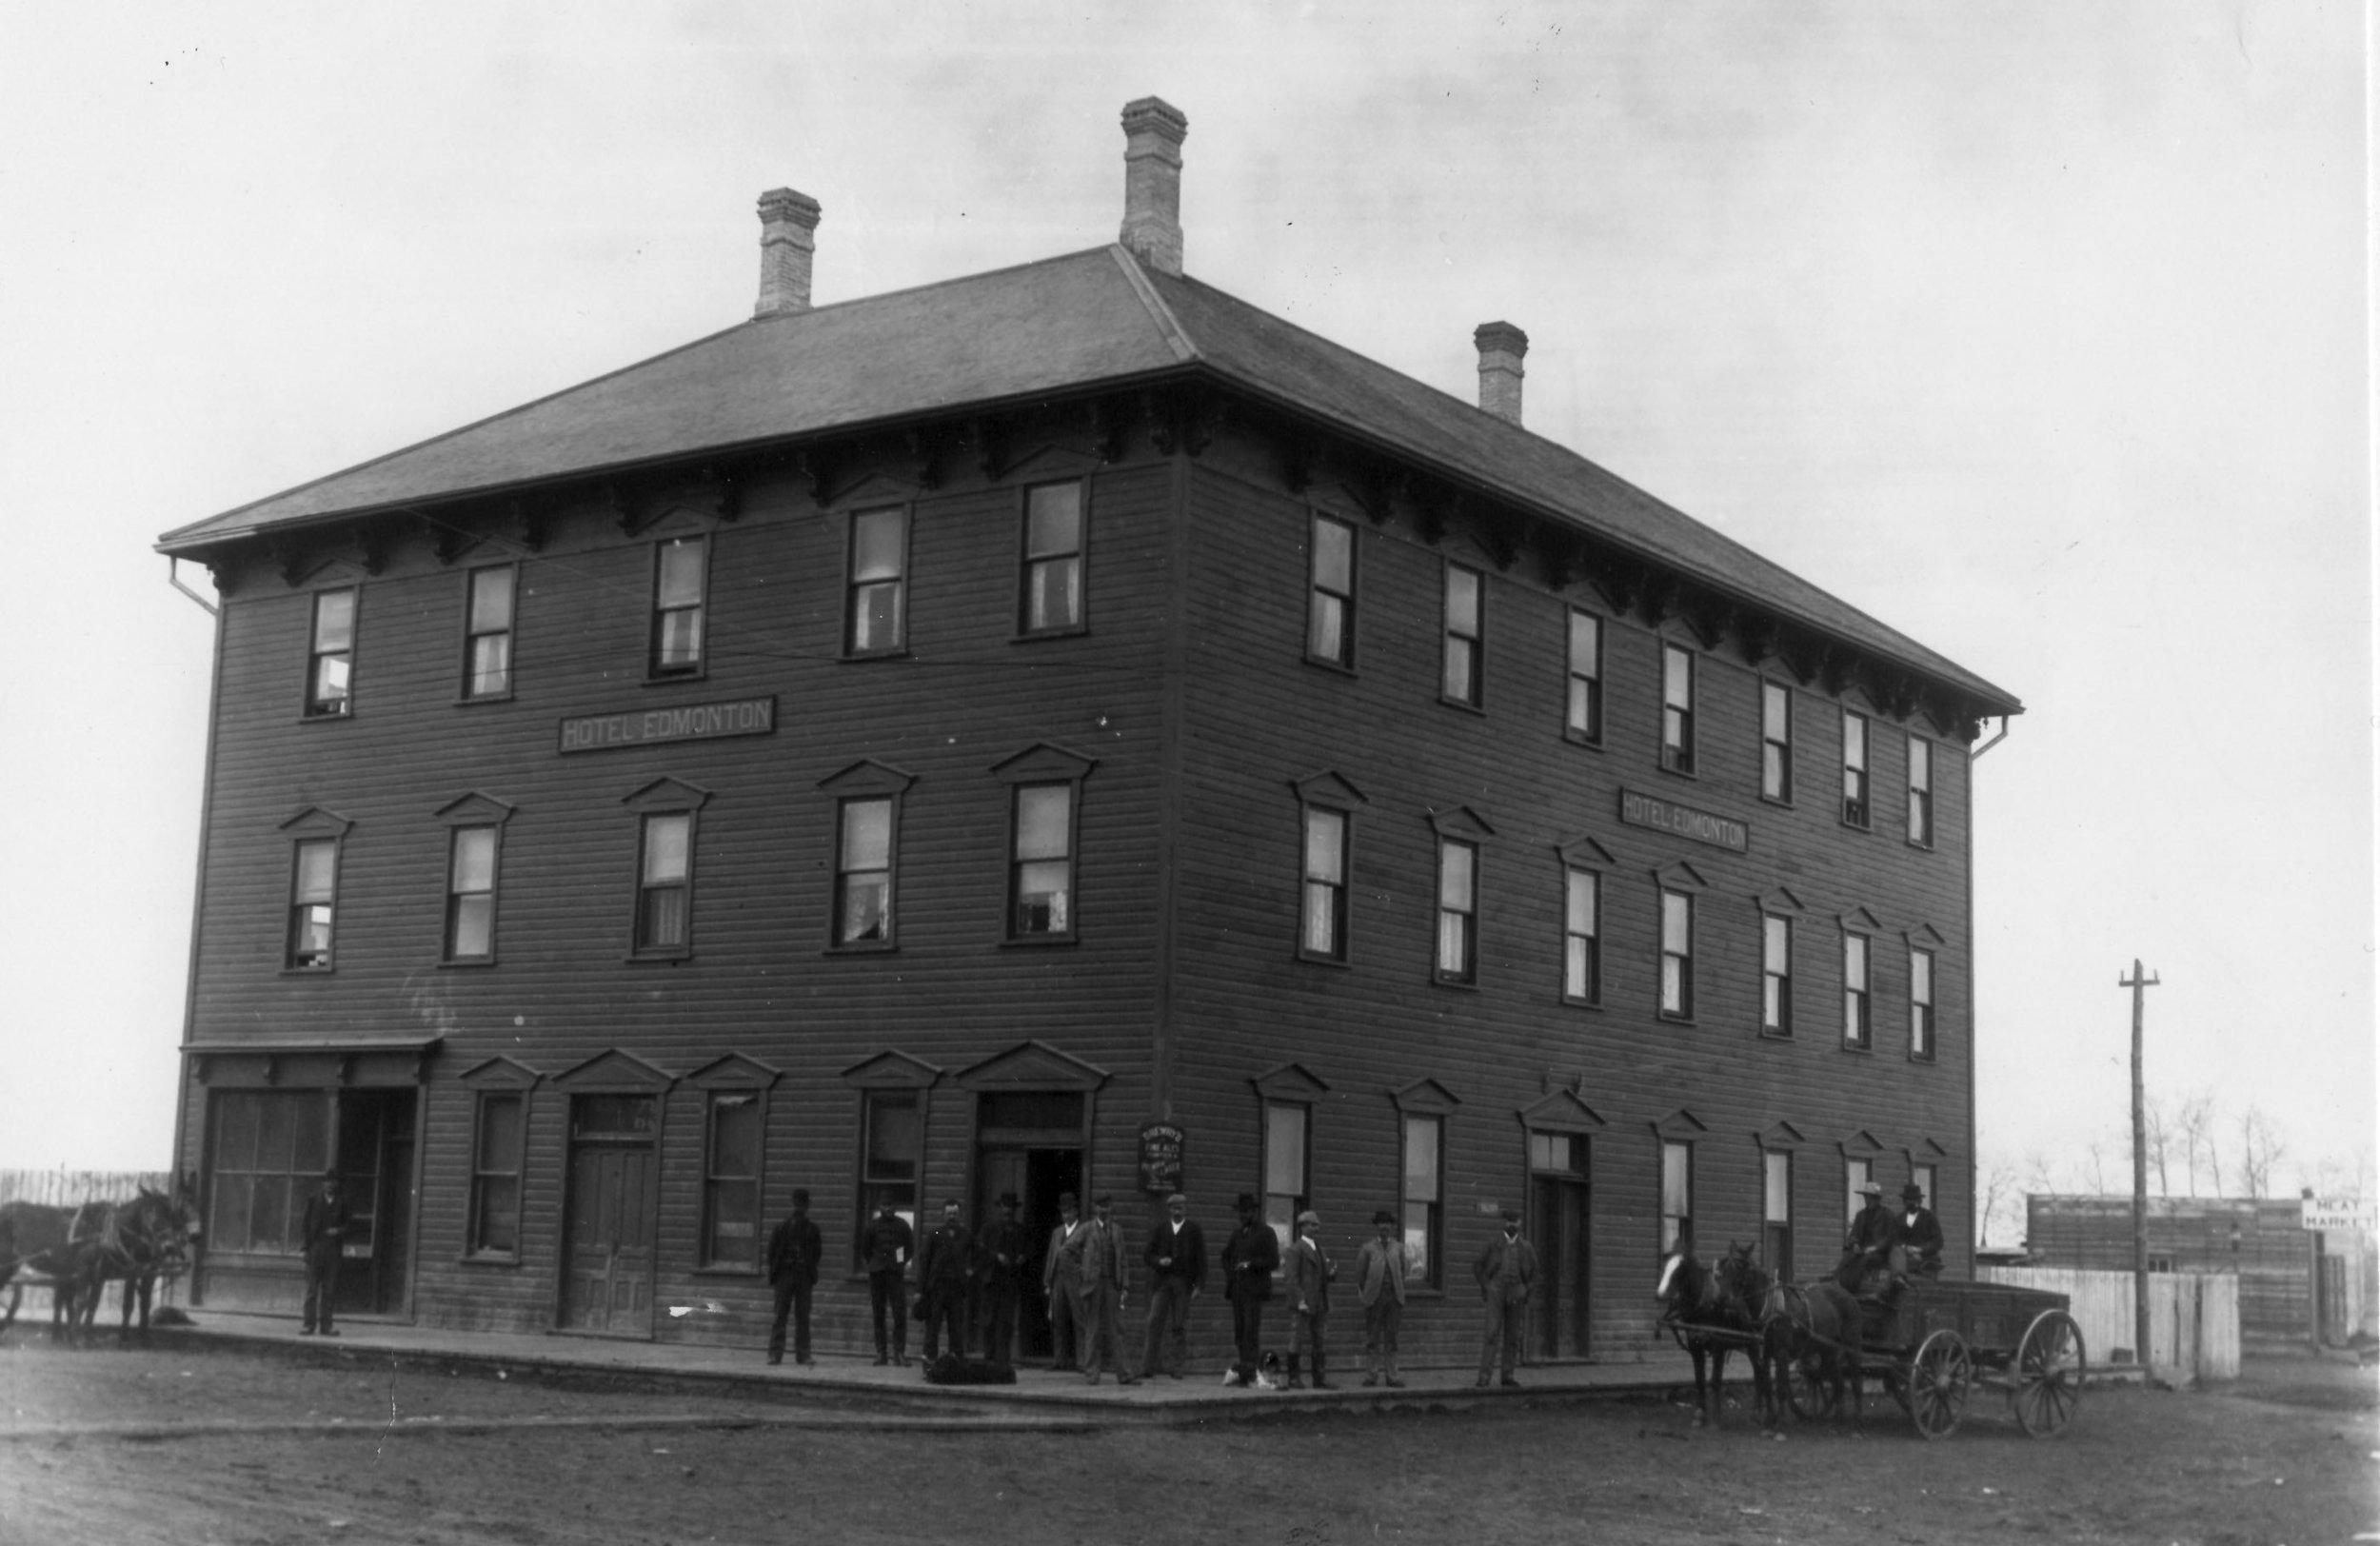 Hist Photo - BW - 1892.jpg